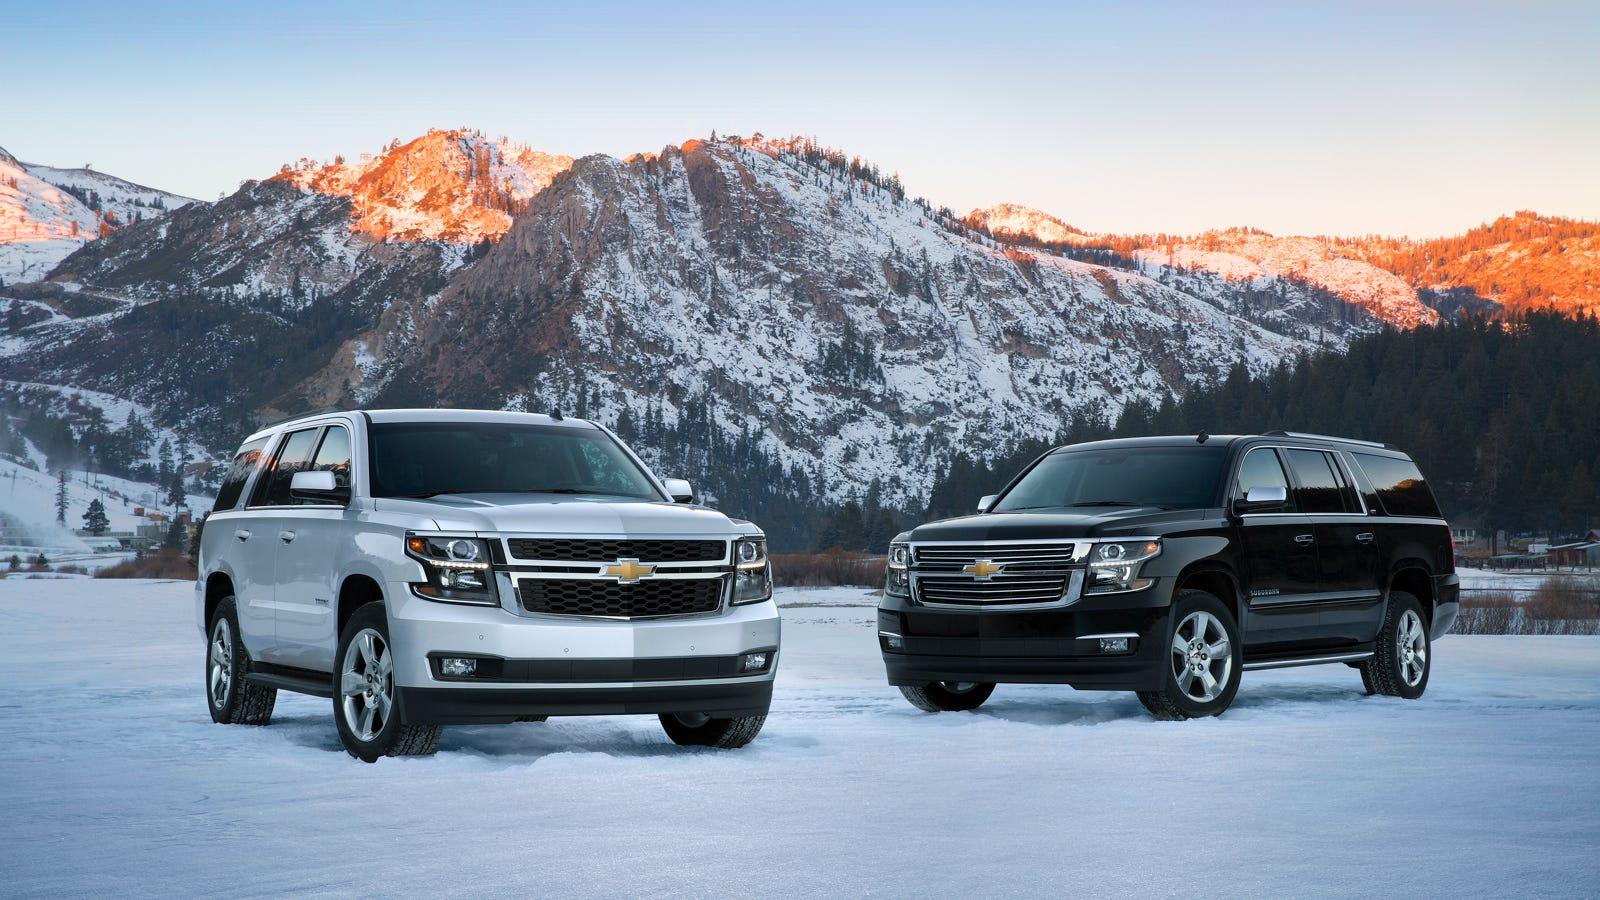 Suburban 2015 chevy suburban mpg : EPA Confirms Better Gas Mileage For 2015 GM Full-Size SUVs